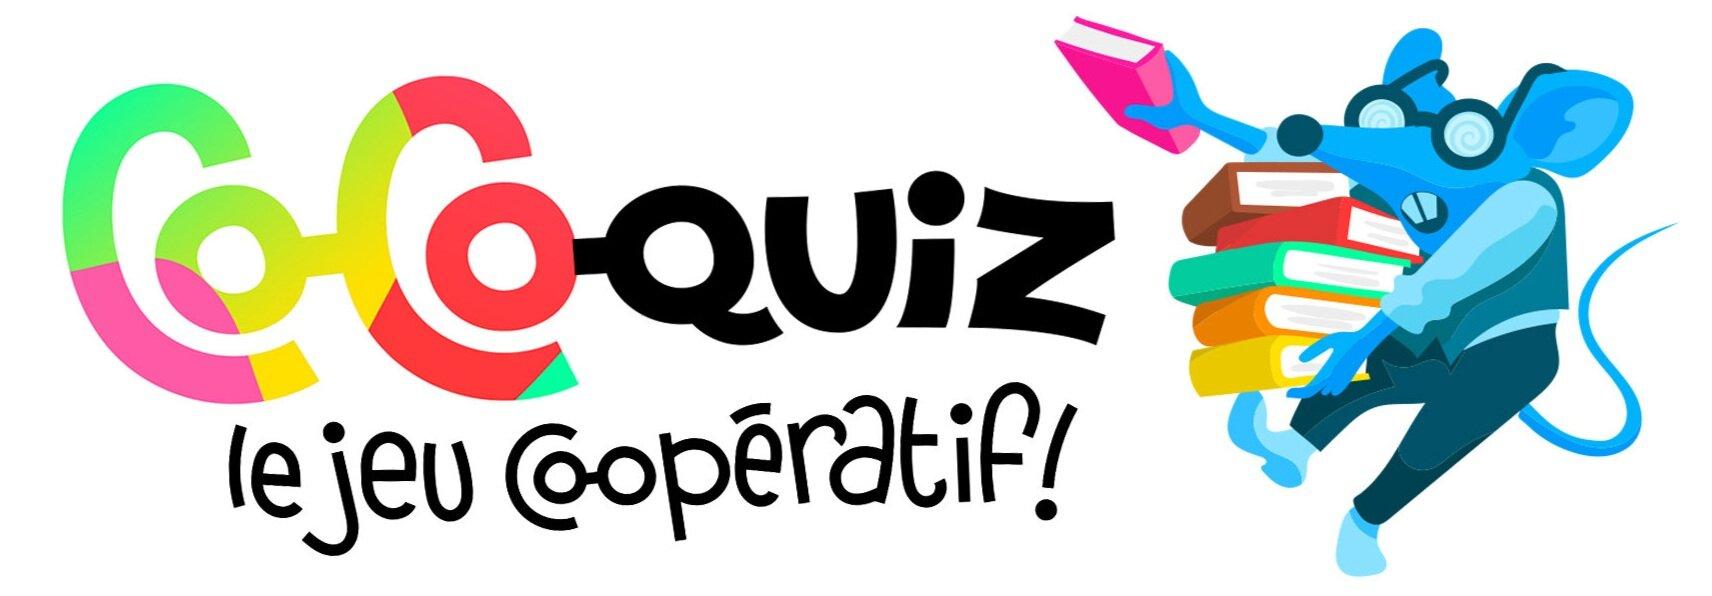 LOGO+COCO+QUIZ+HORIZONTAL+PABLOKA.jpg